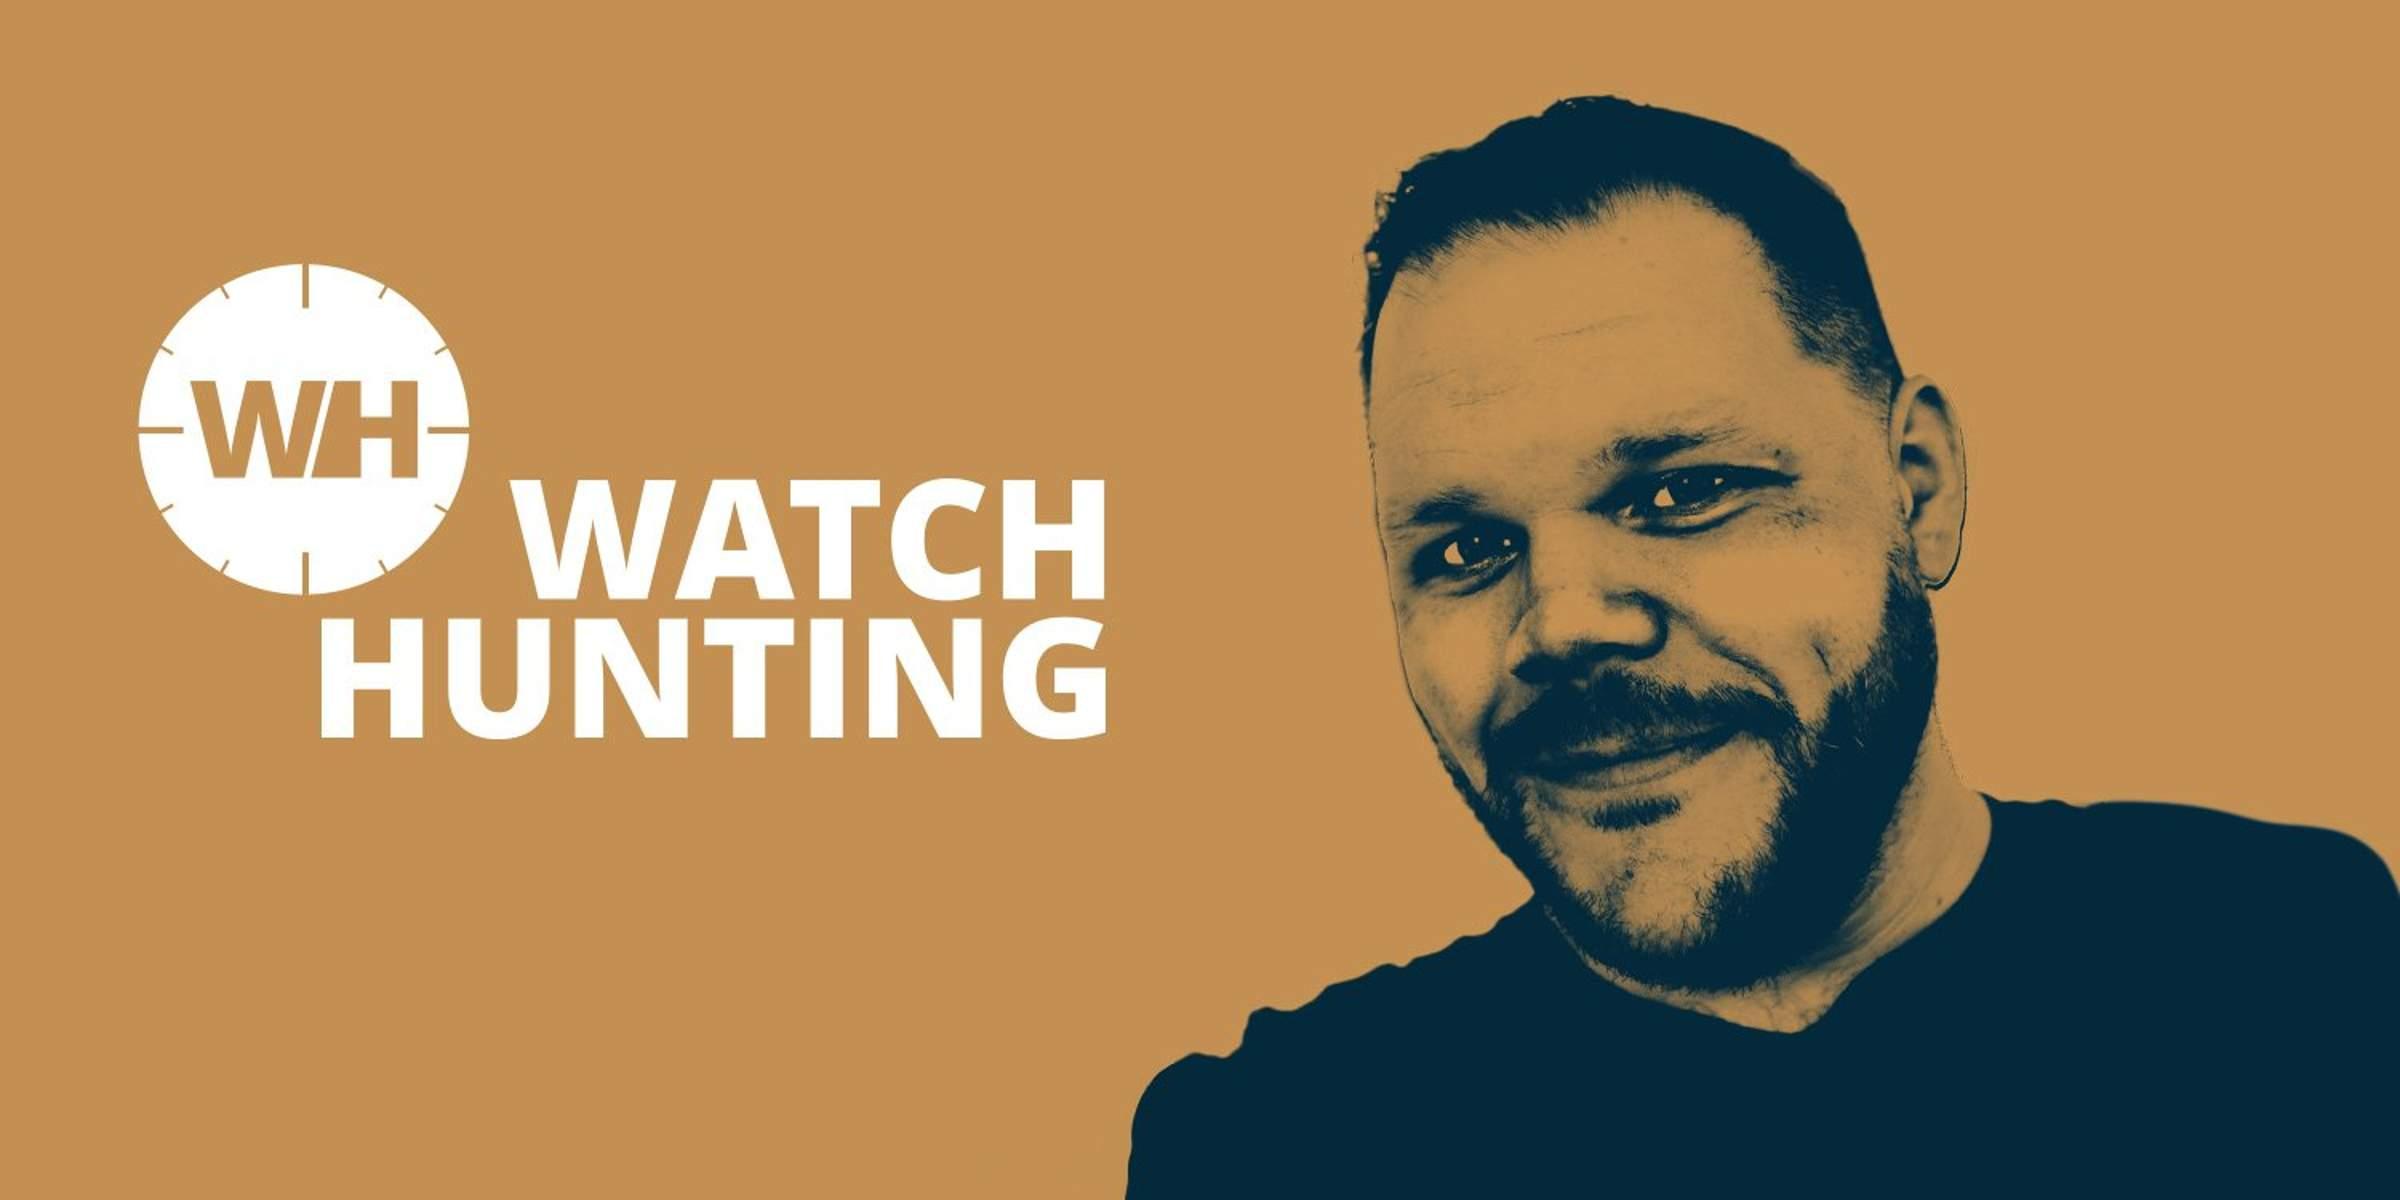 Watch-Hunting-Chris-Mann-Magazin-2-1